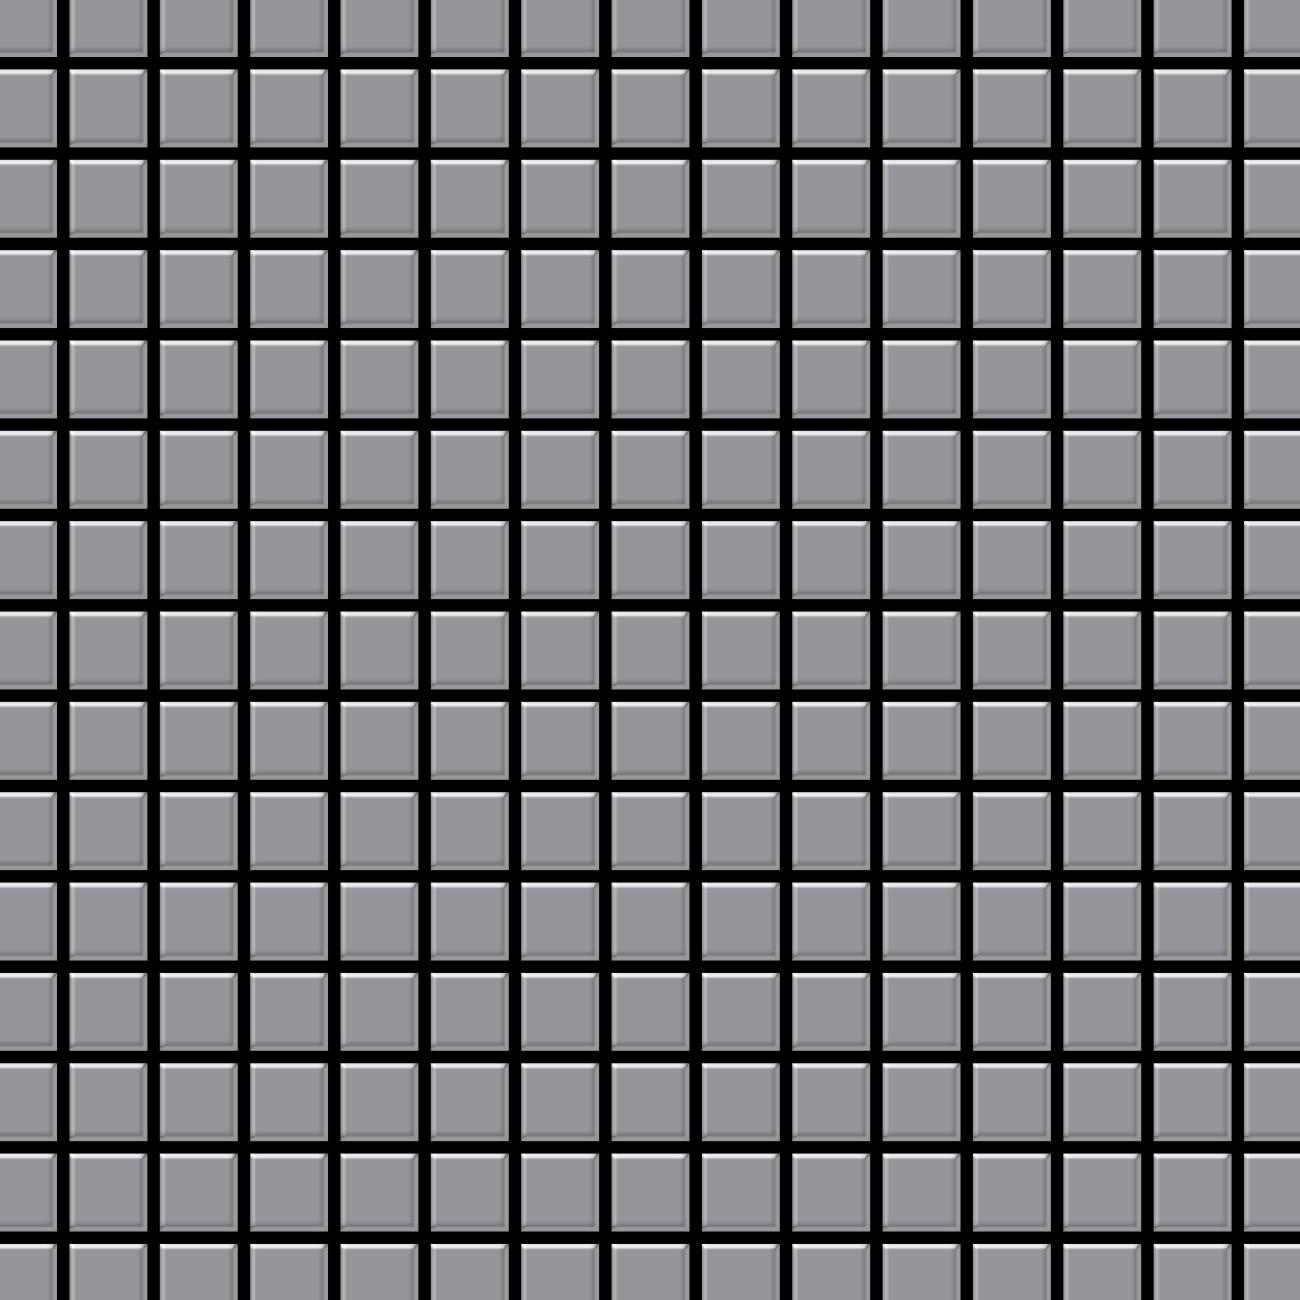 mosaik fliese massiv metall edelstahl matt grau 1 6mm stark mosaic s s ma ebay. Black Bedroom Furniture Sets. Home Design Ideas